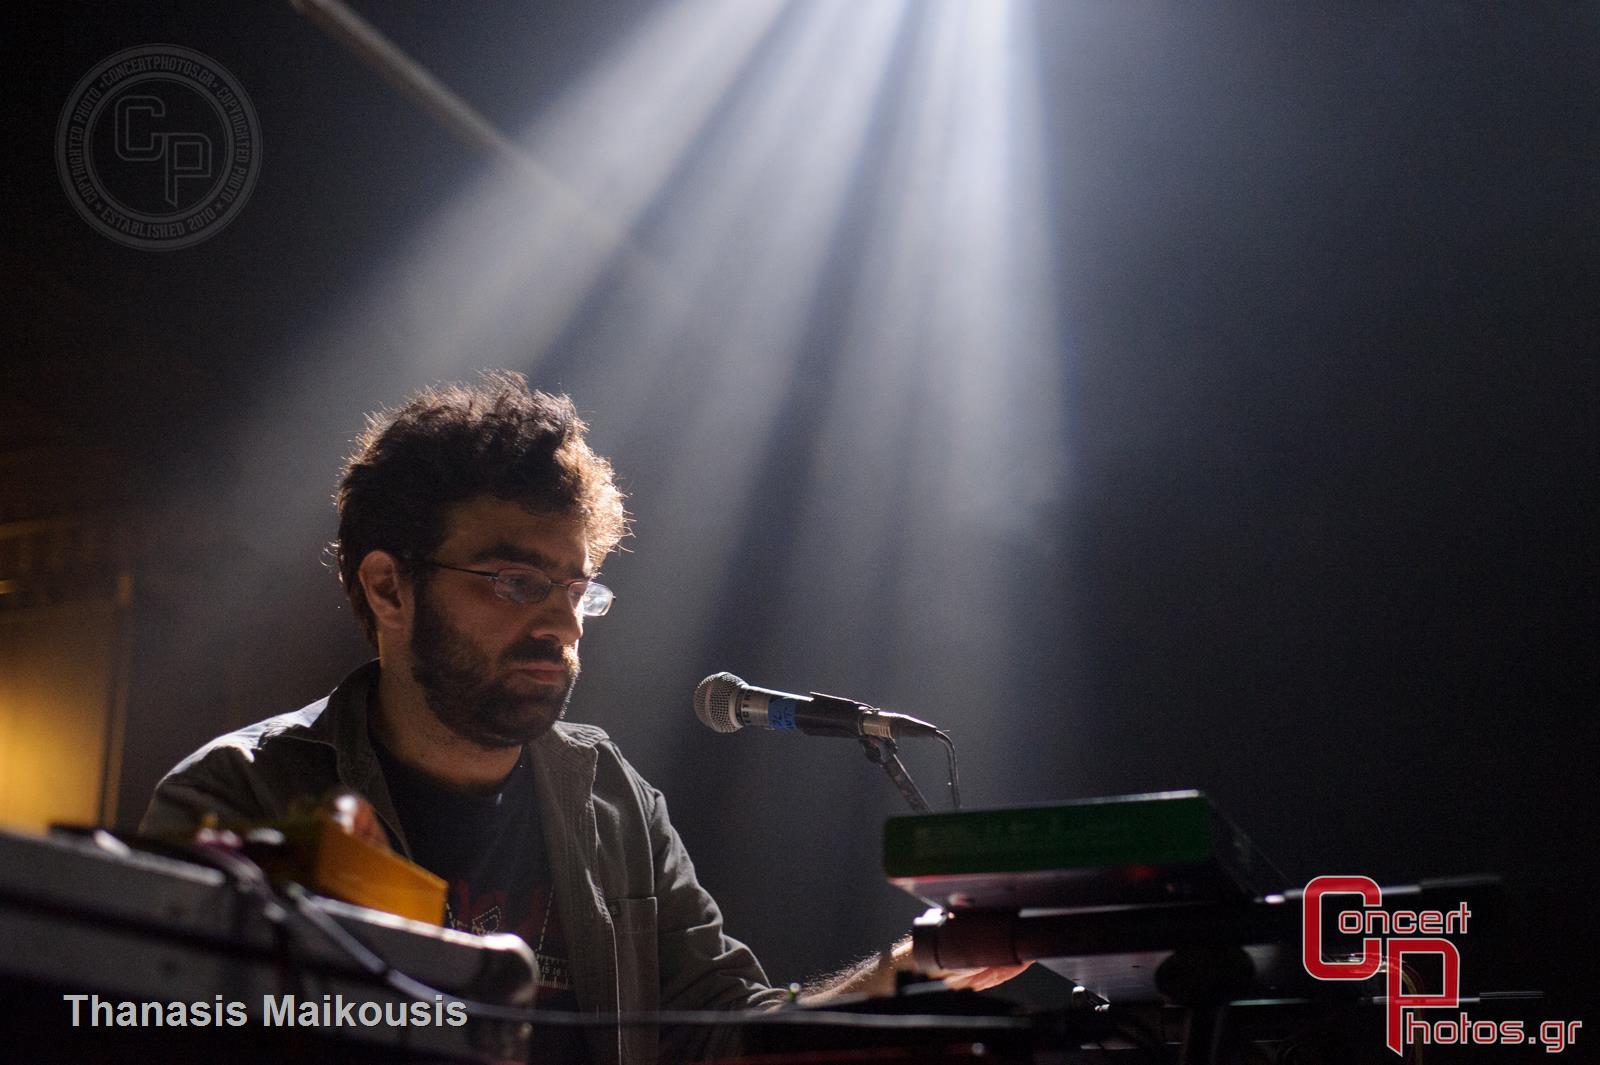 Electric Litany -  GravitySays-Electric Litany GravitySays photographer: Thanasis Maikousis - concertphotos_20150418_21_09_52